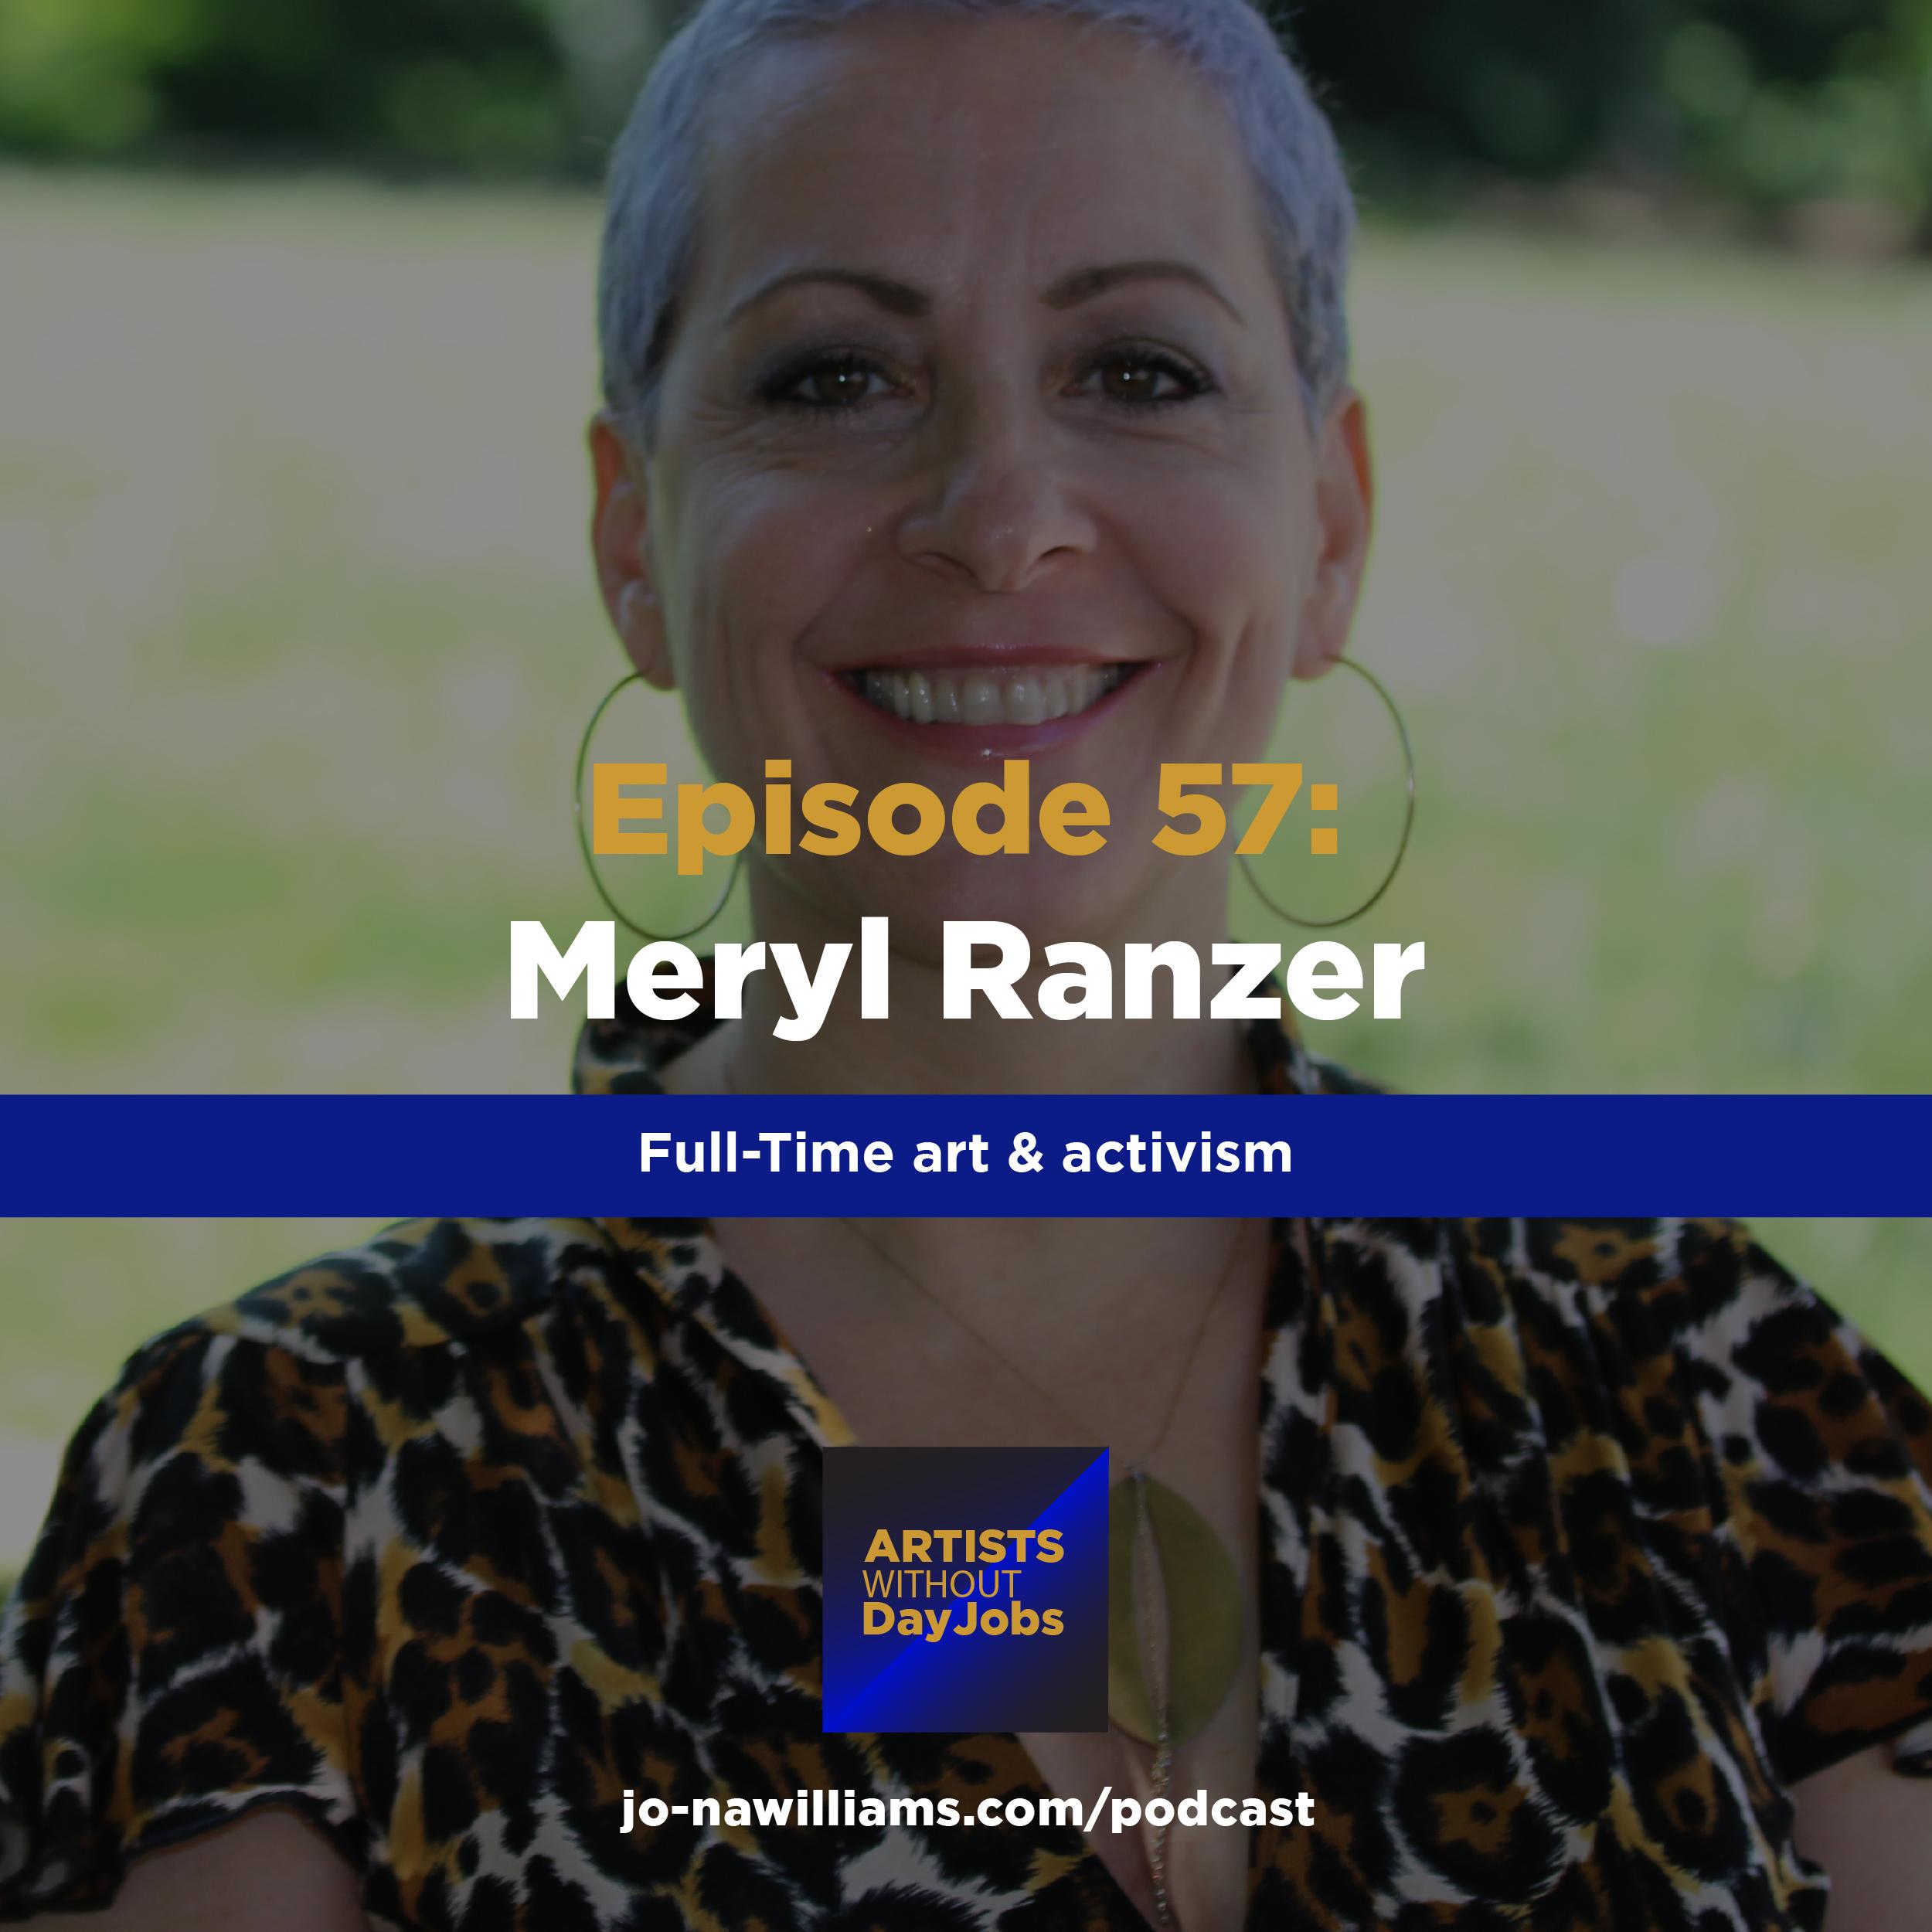 Ep 57: Fulltime art & activism with Meryl Ranzer